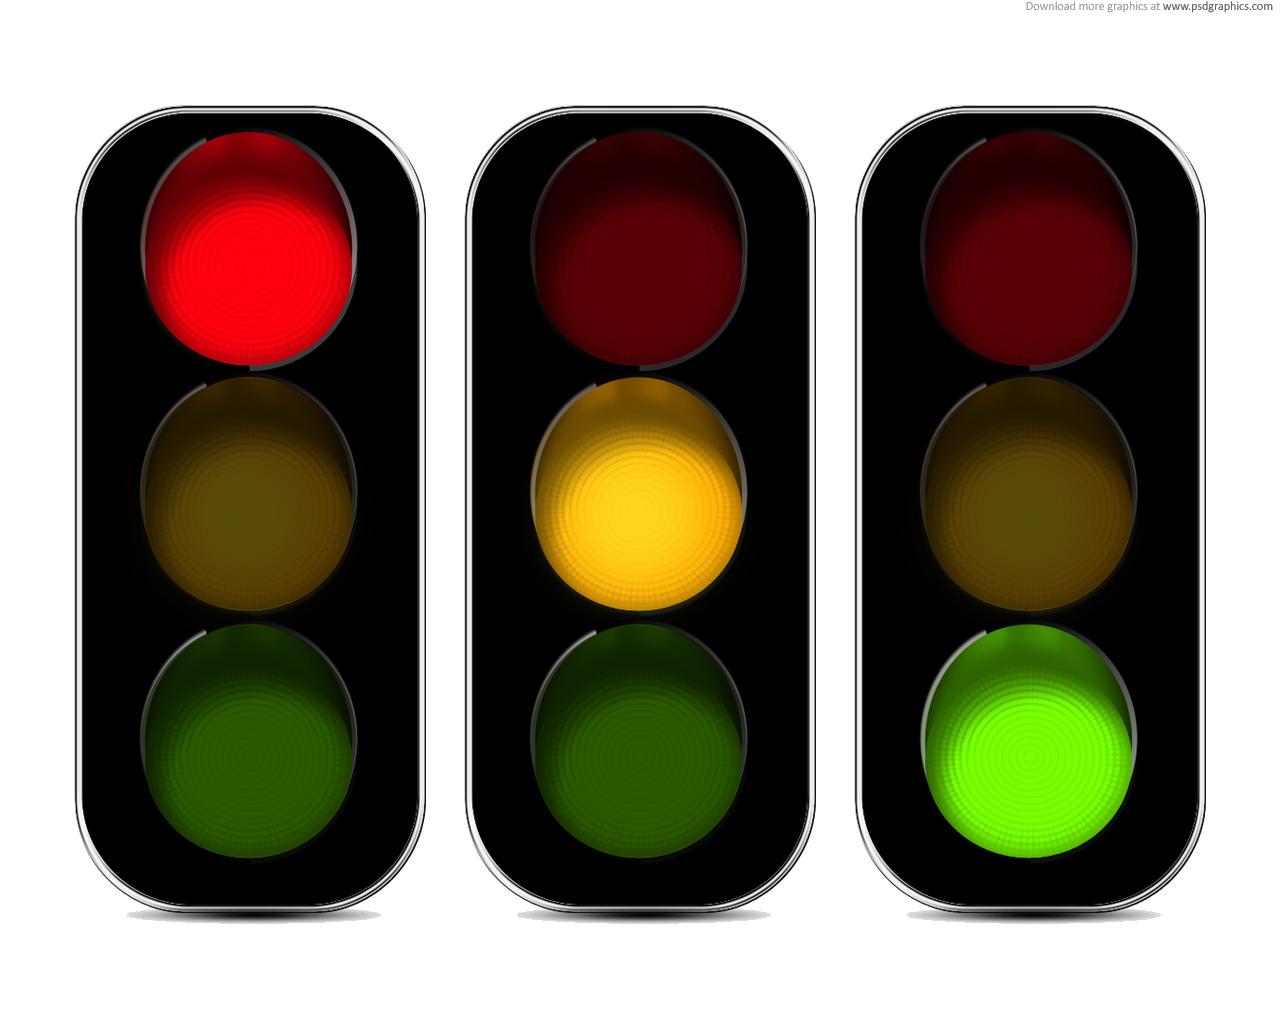 December clipart lighting. Traffic light icon web